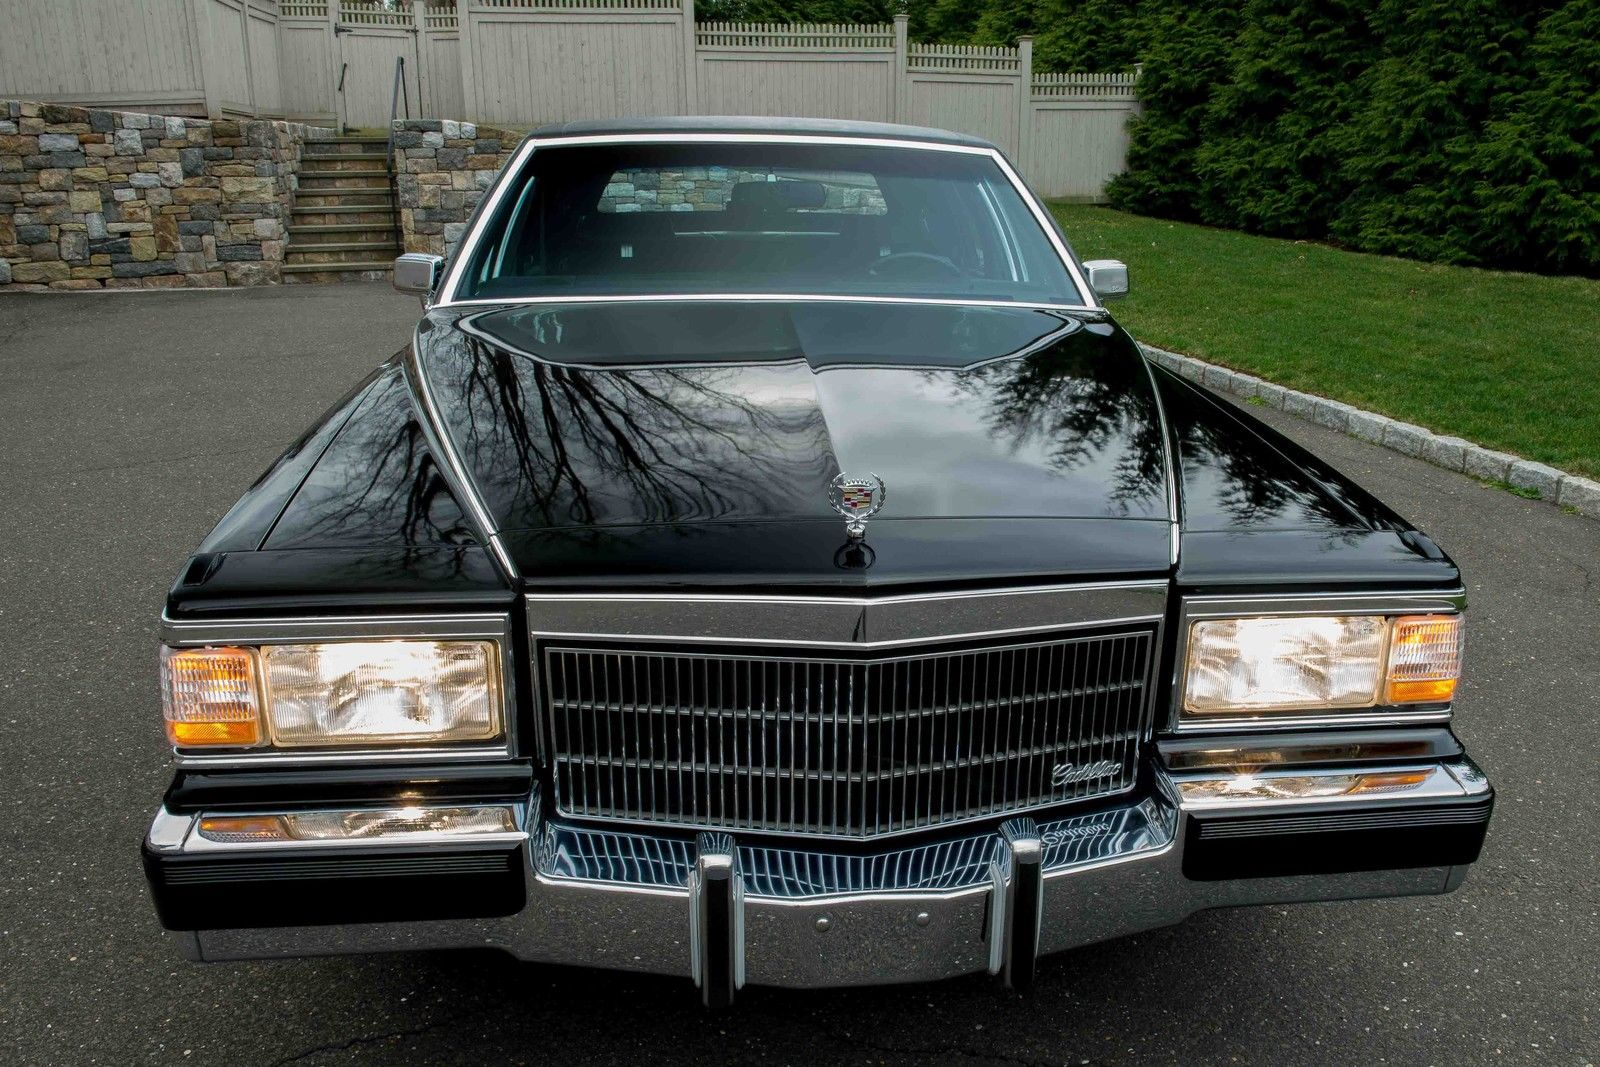 1990 Cadillac Brougham D'elegance Sedan for sale